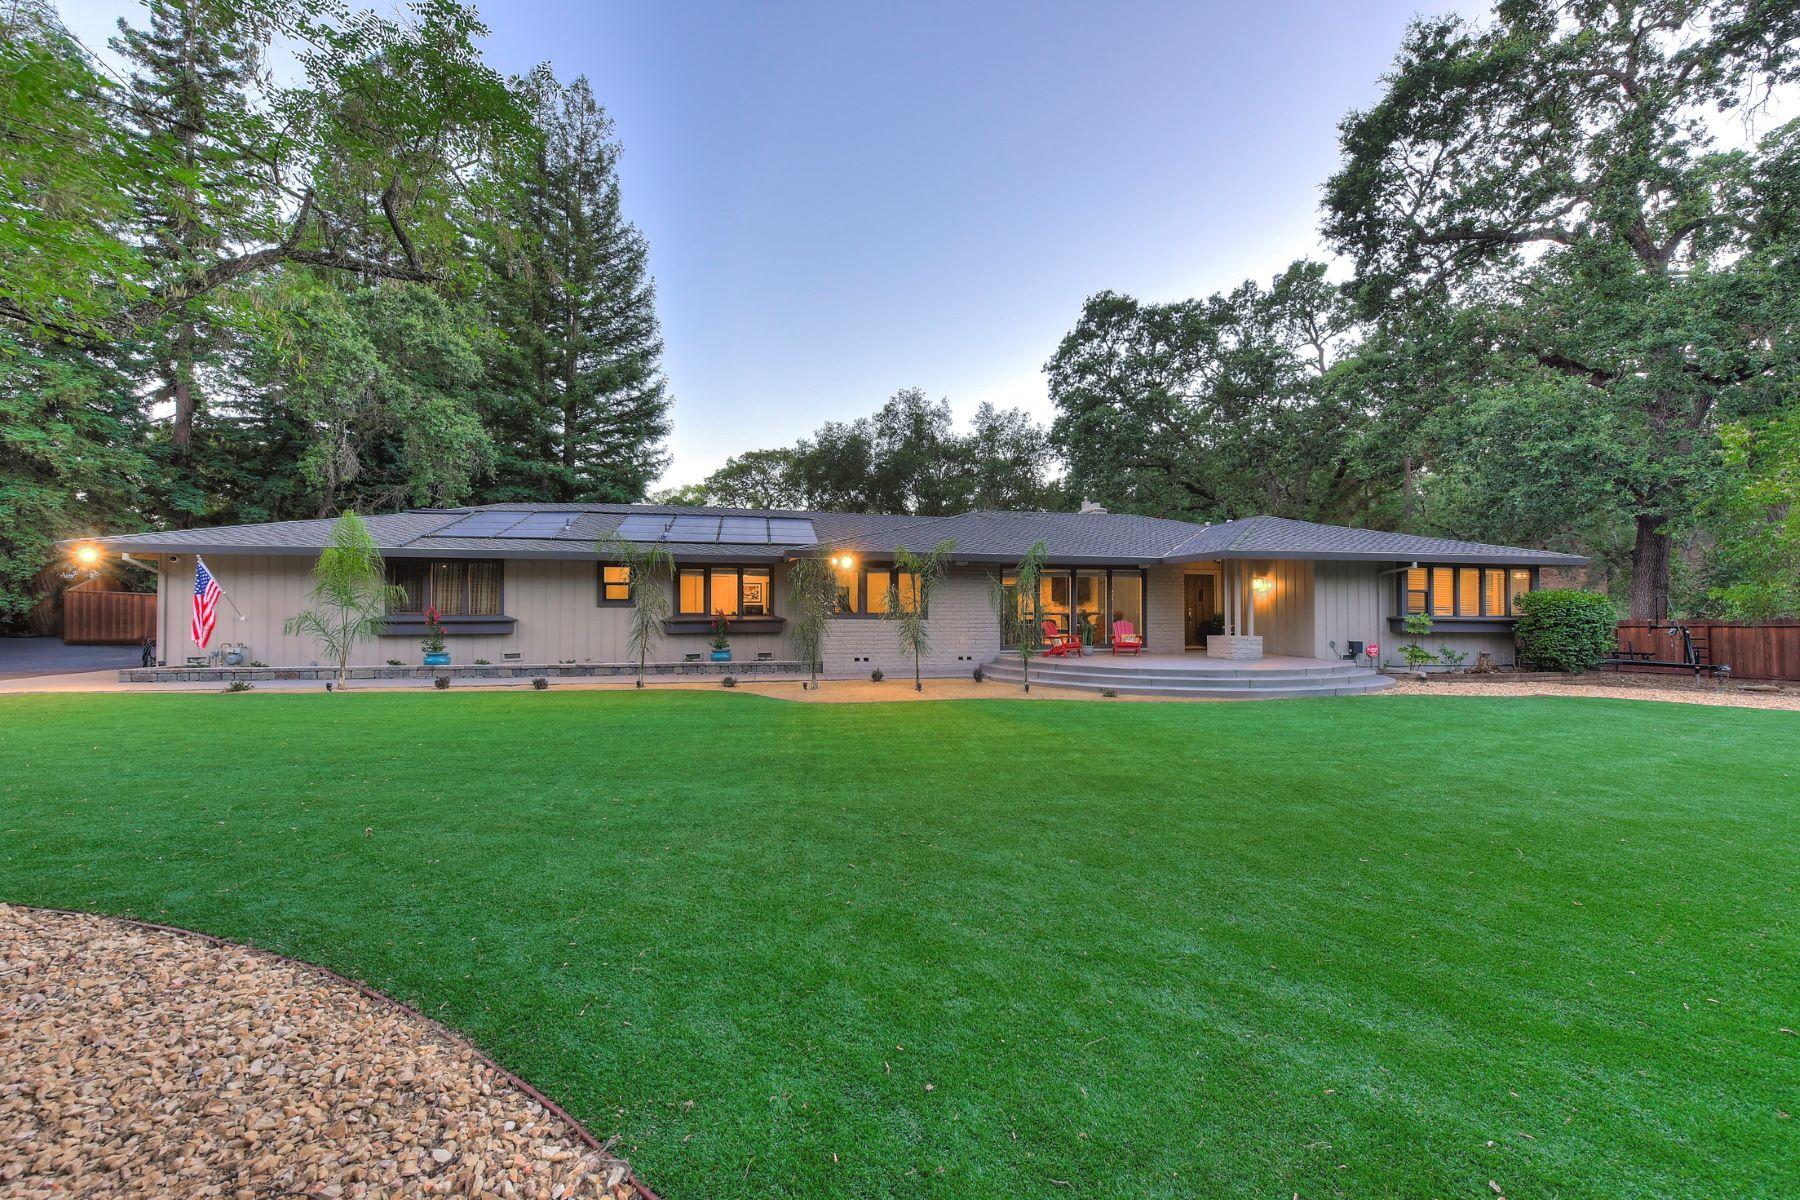 Single Family Home for Sale at 2194 Allegheny Rd, El Dorado Hills, CA 95762 El Dorado Hills, California 95762 United States